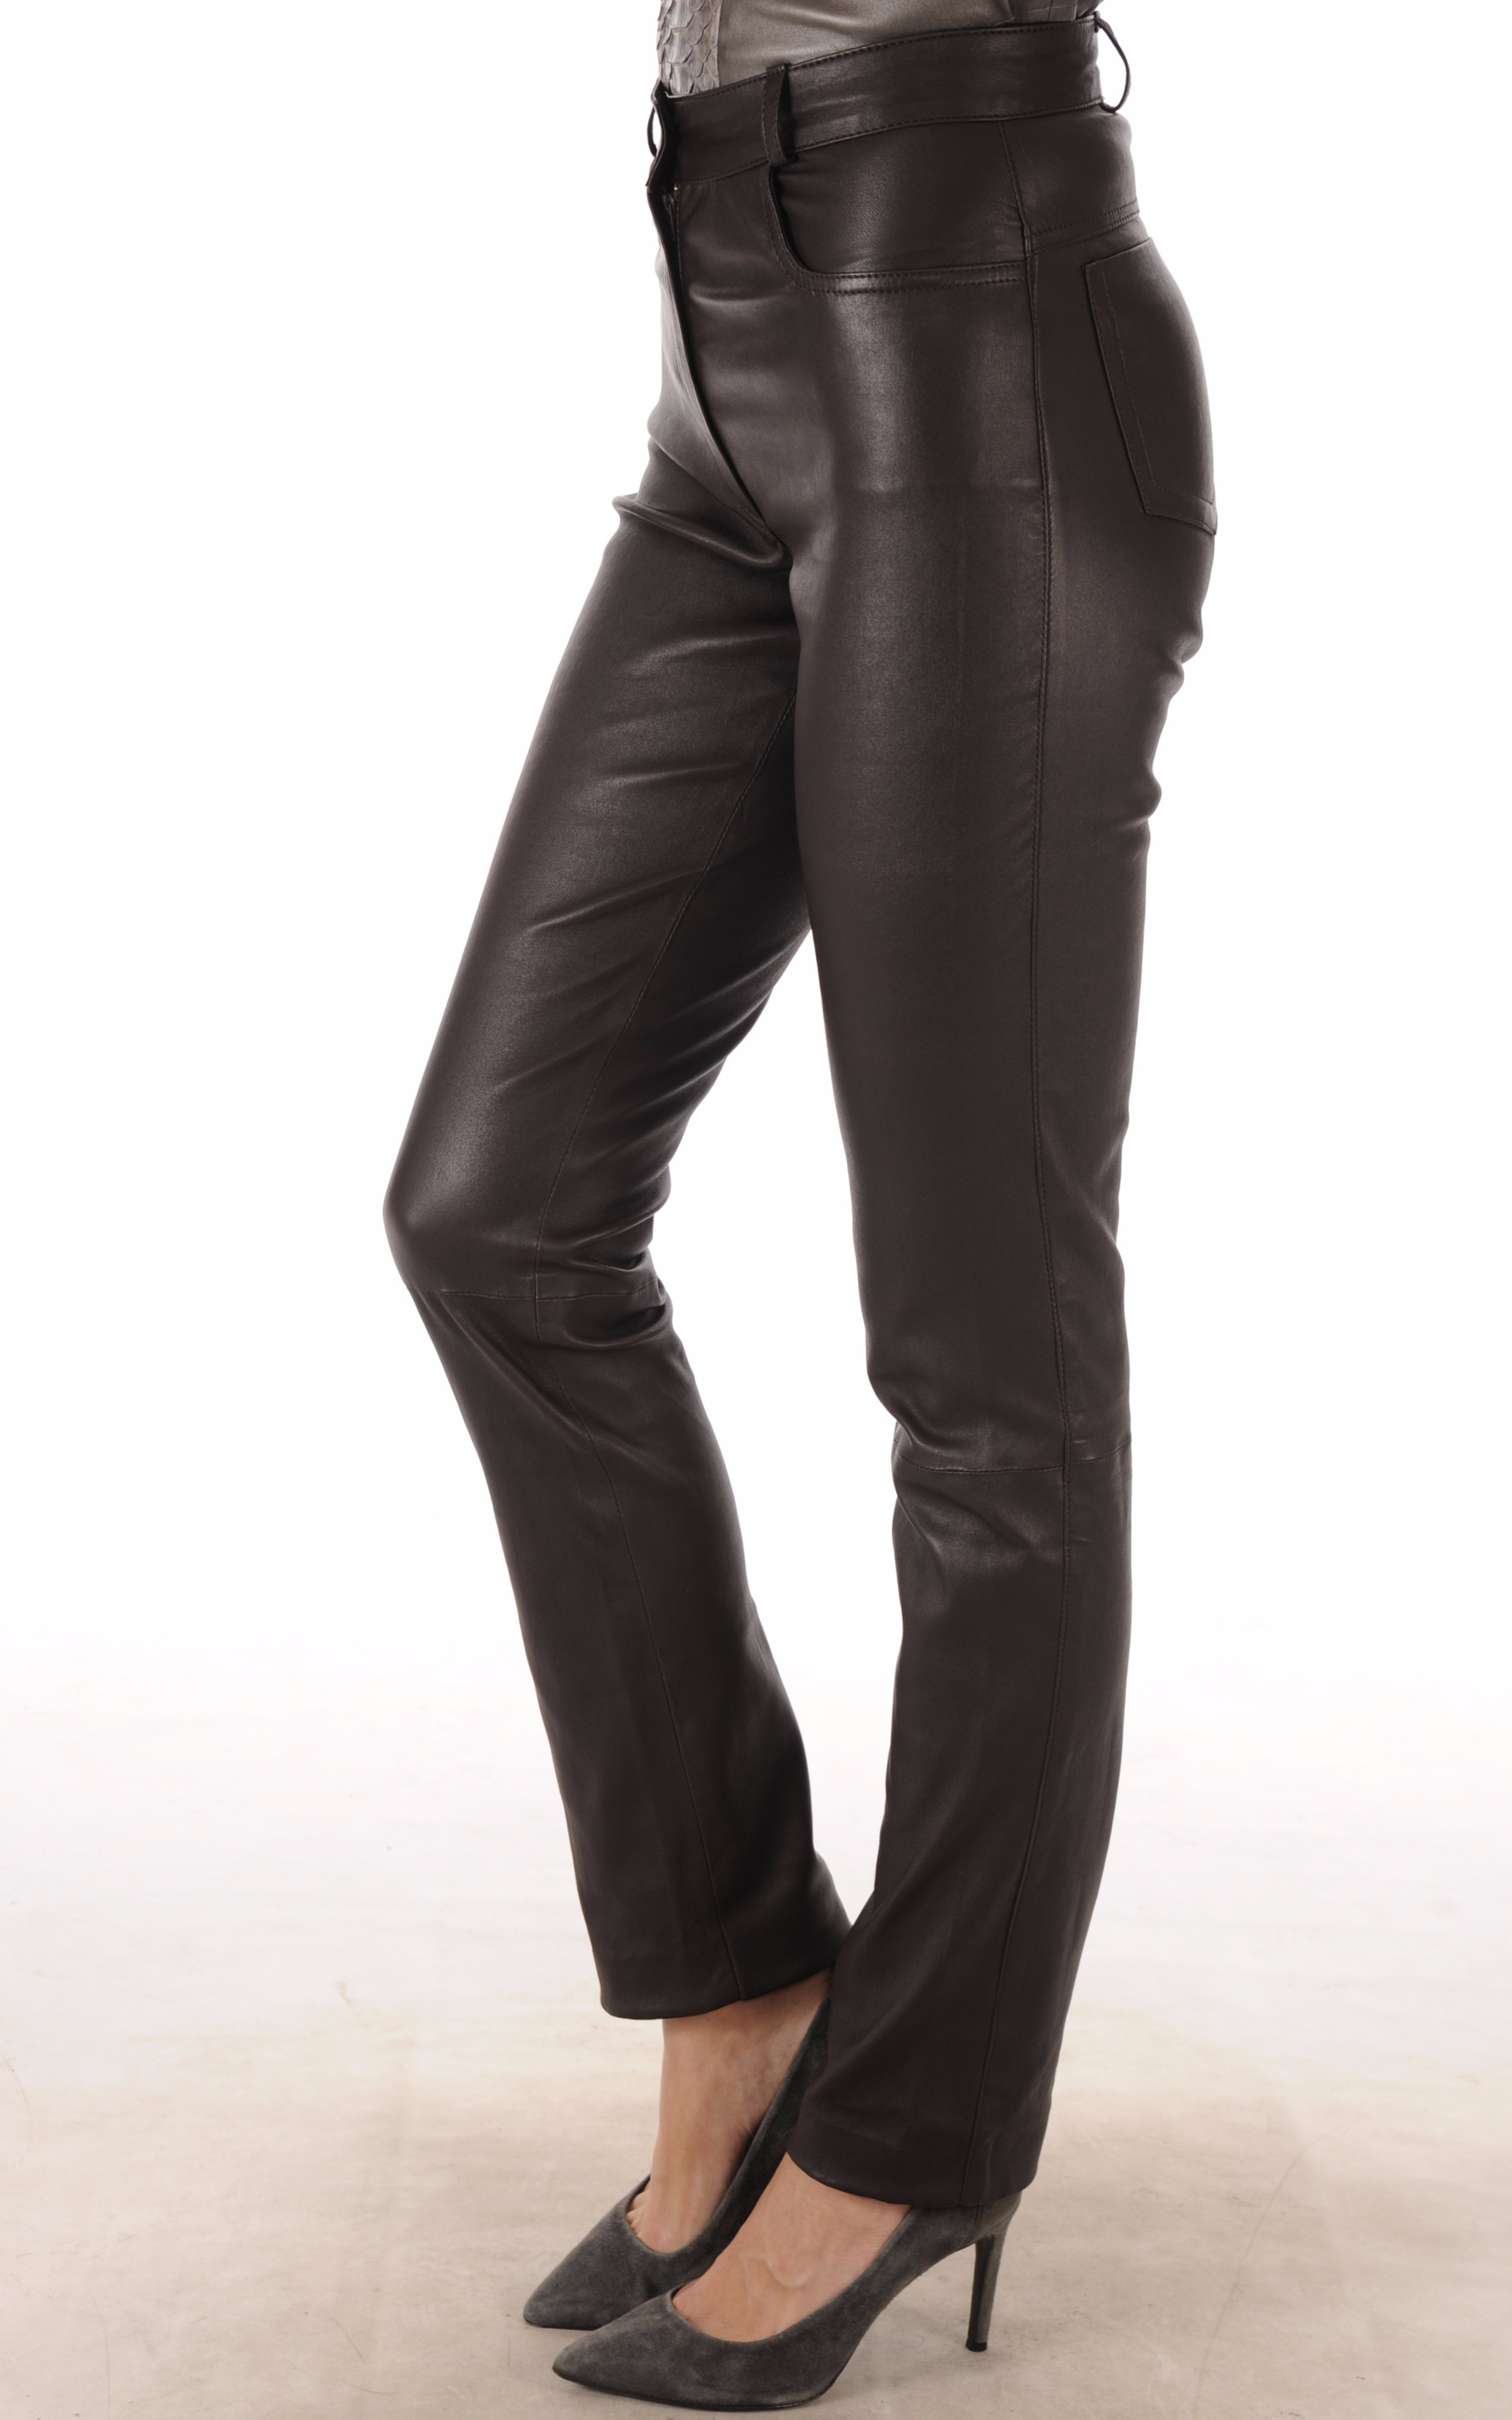 Pantalon Cuir Stretch Marron La Canadienne